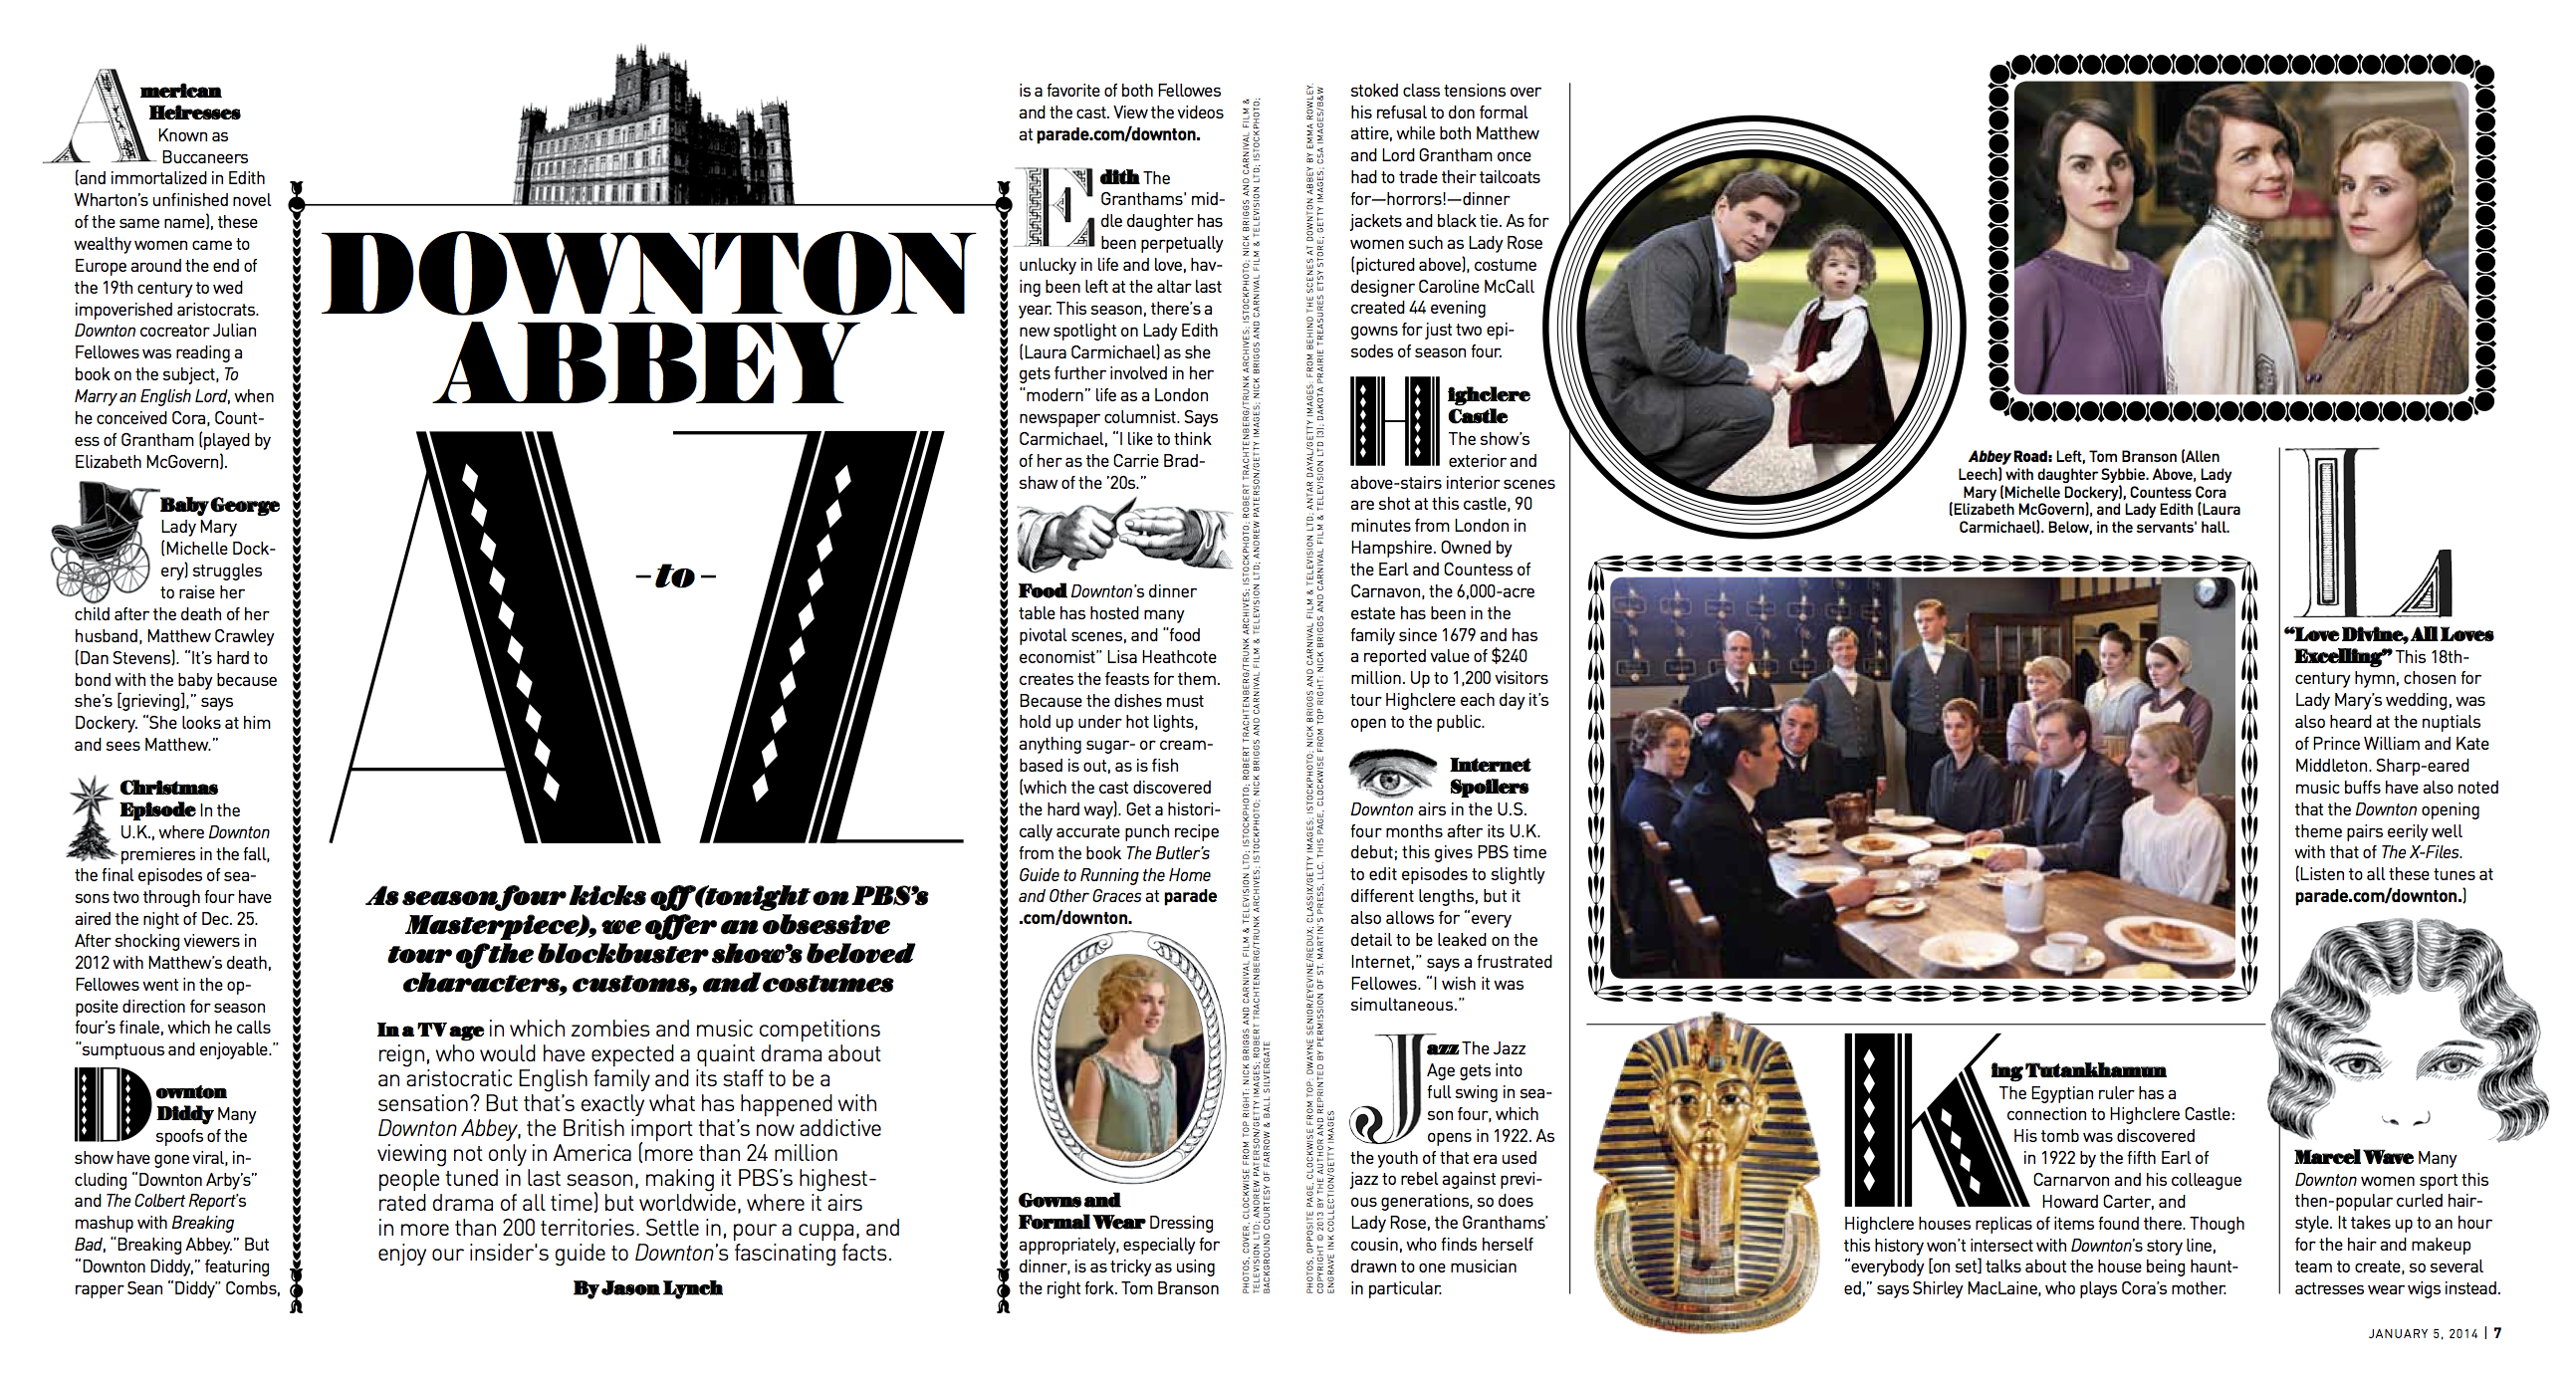 Downton.story